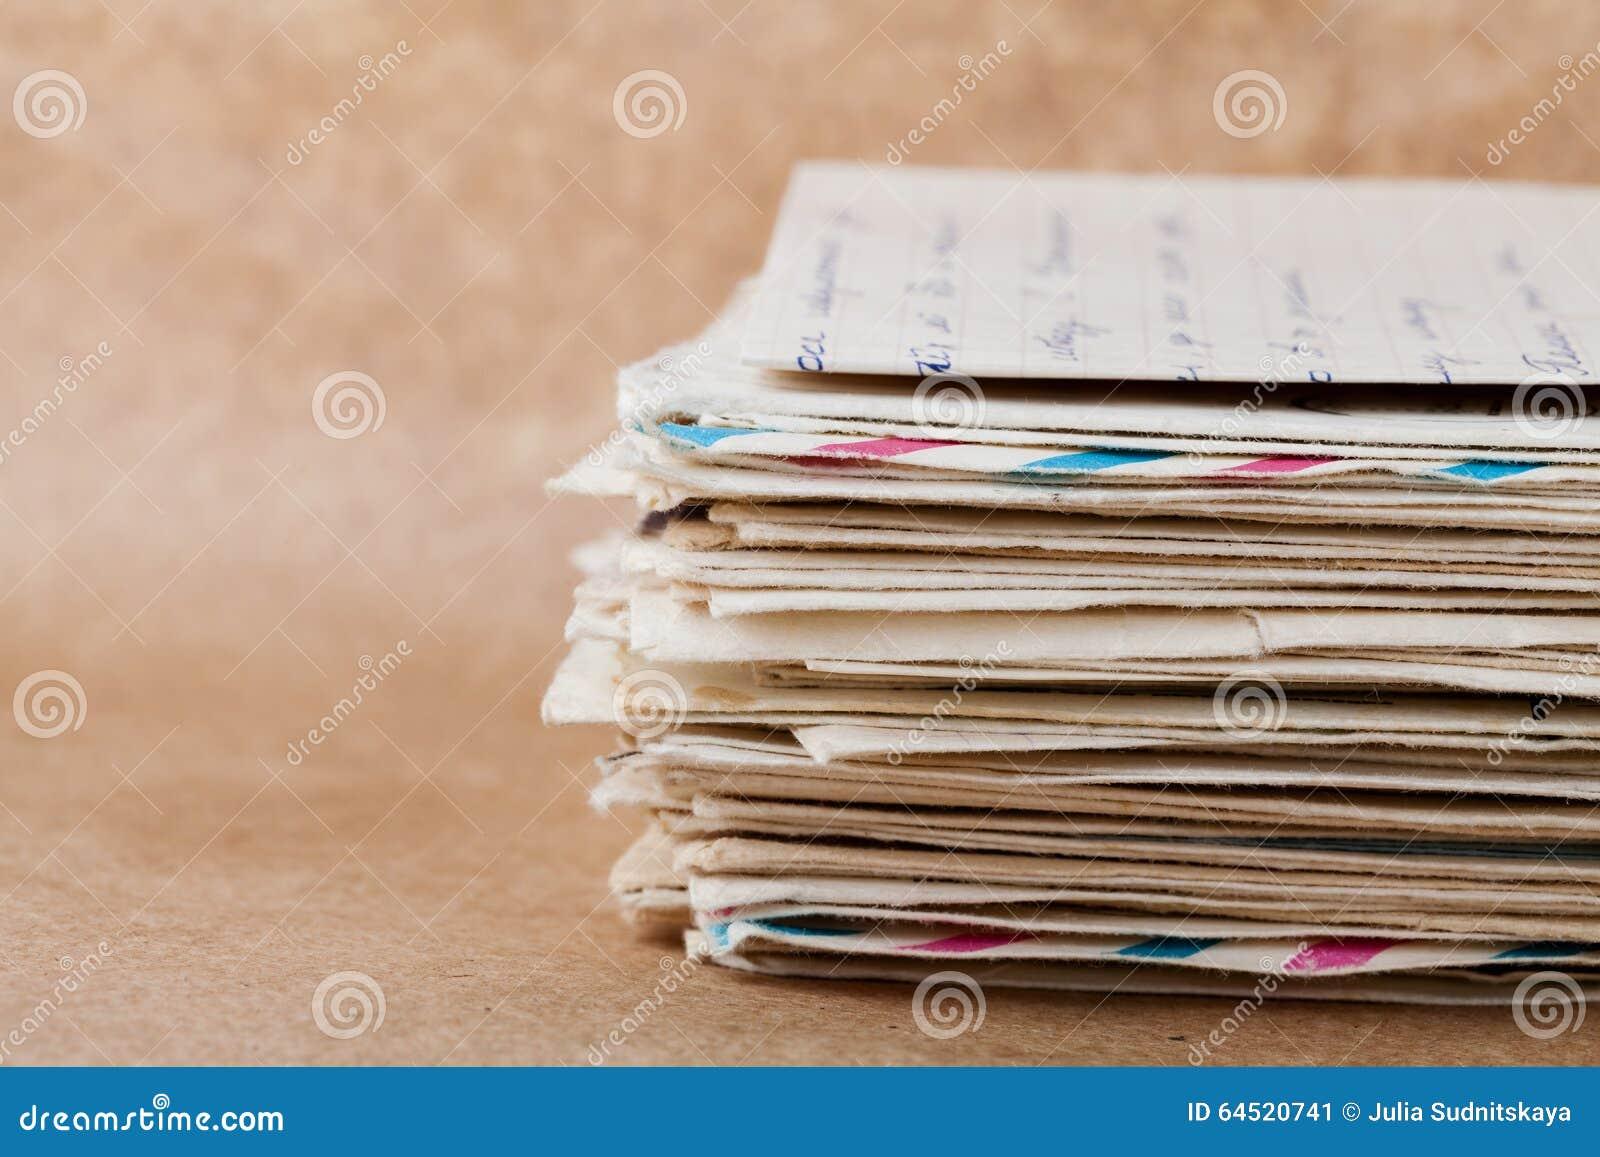 Stapel oude enveloppen en brieven op kraftpapier-document